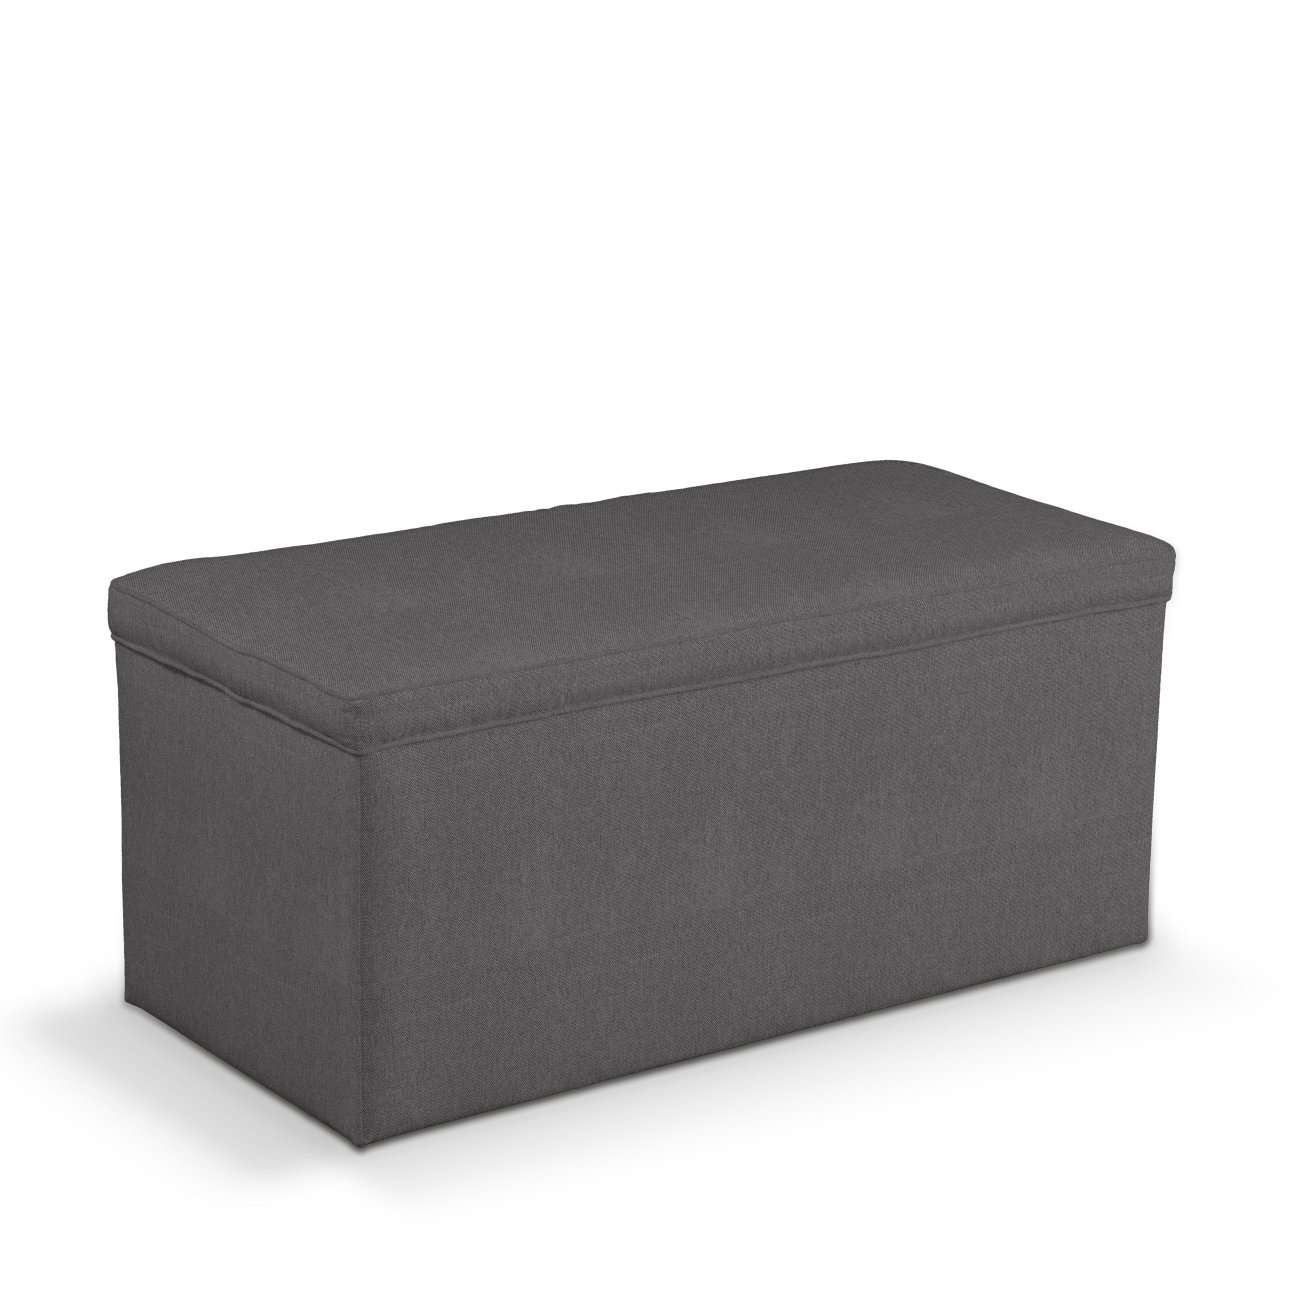 Dežė/skrynia/daiktadėžė kolekcijoje Etna , audinys: 705-35